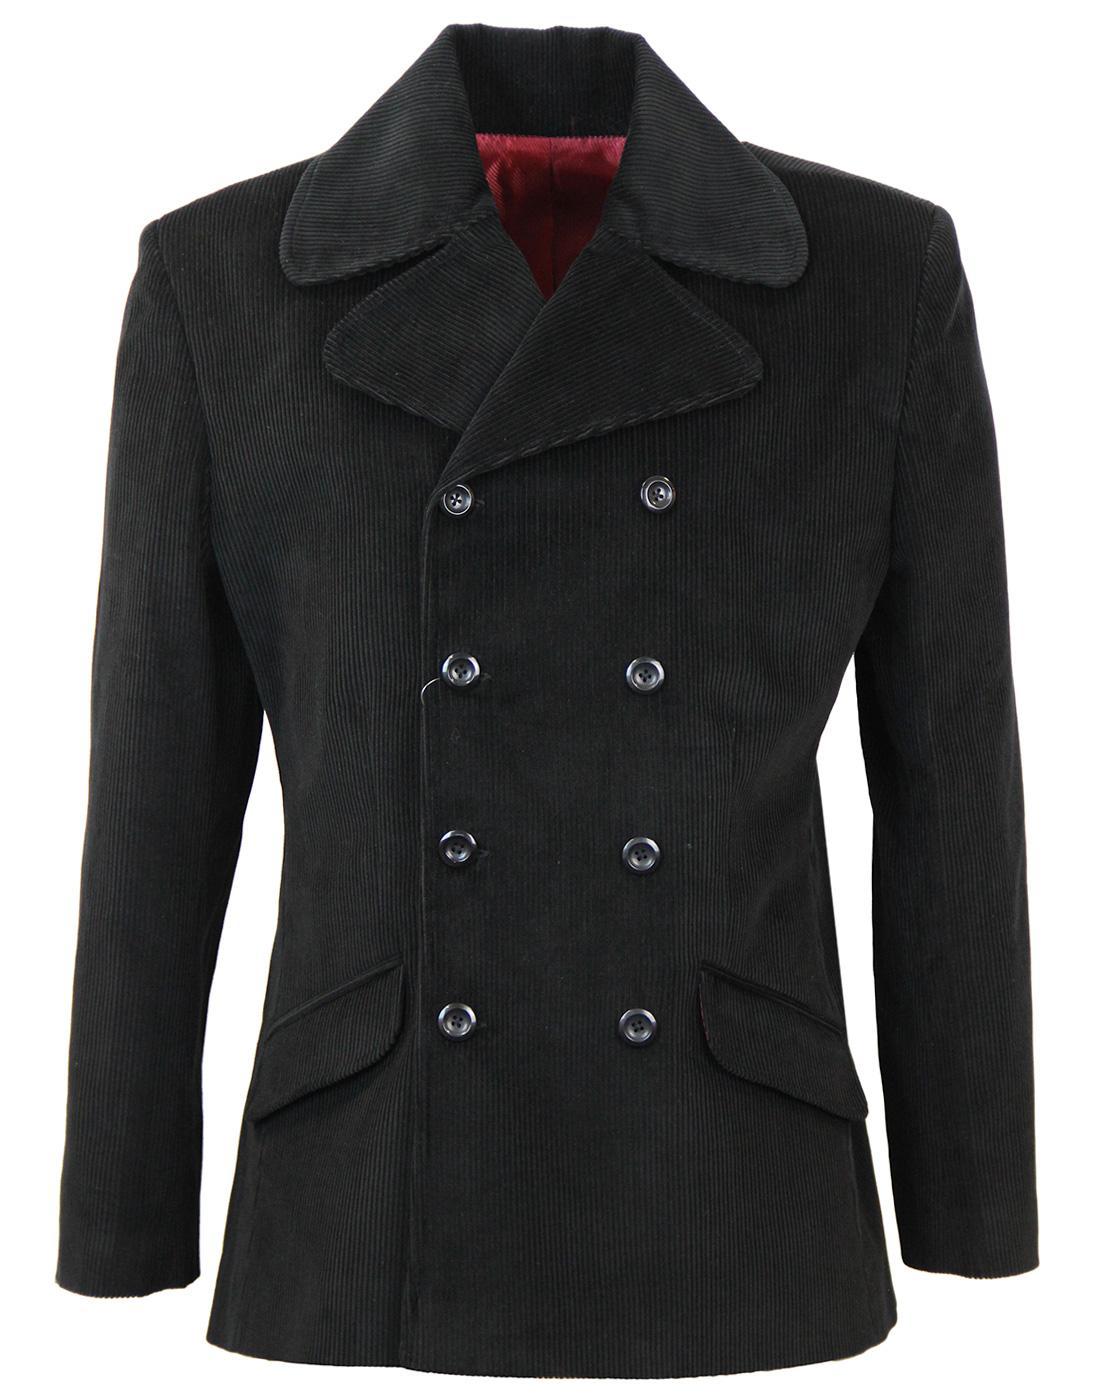 Rare Breed Suit MADCAP ENGLAND 60s Mod Suit- Black